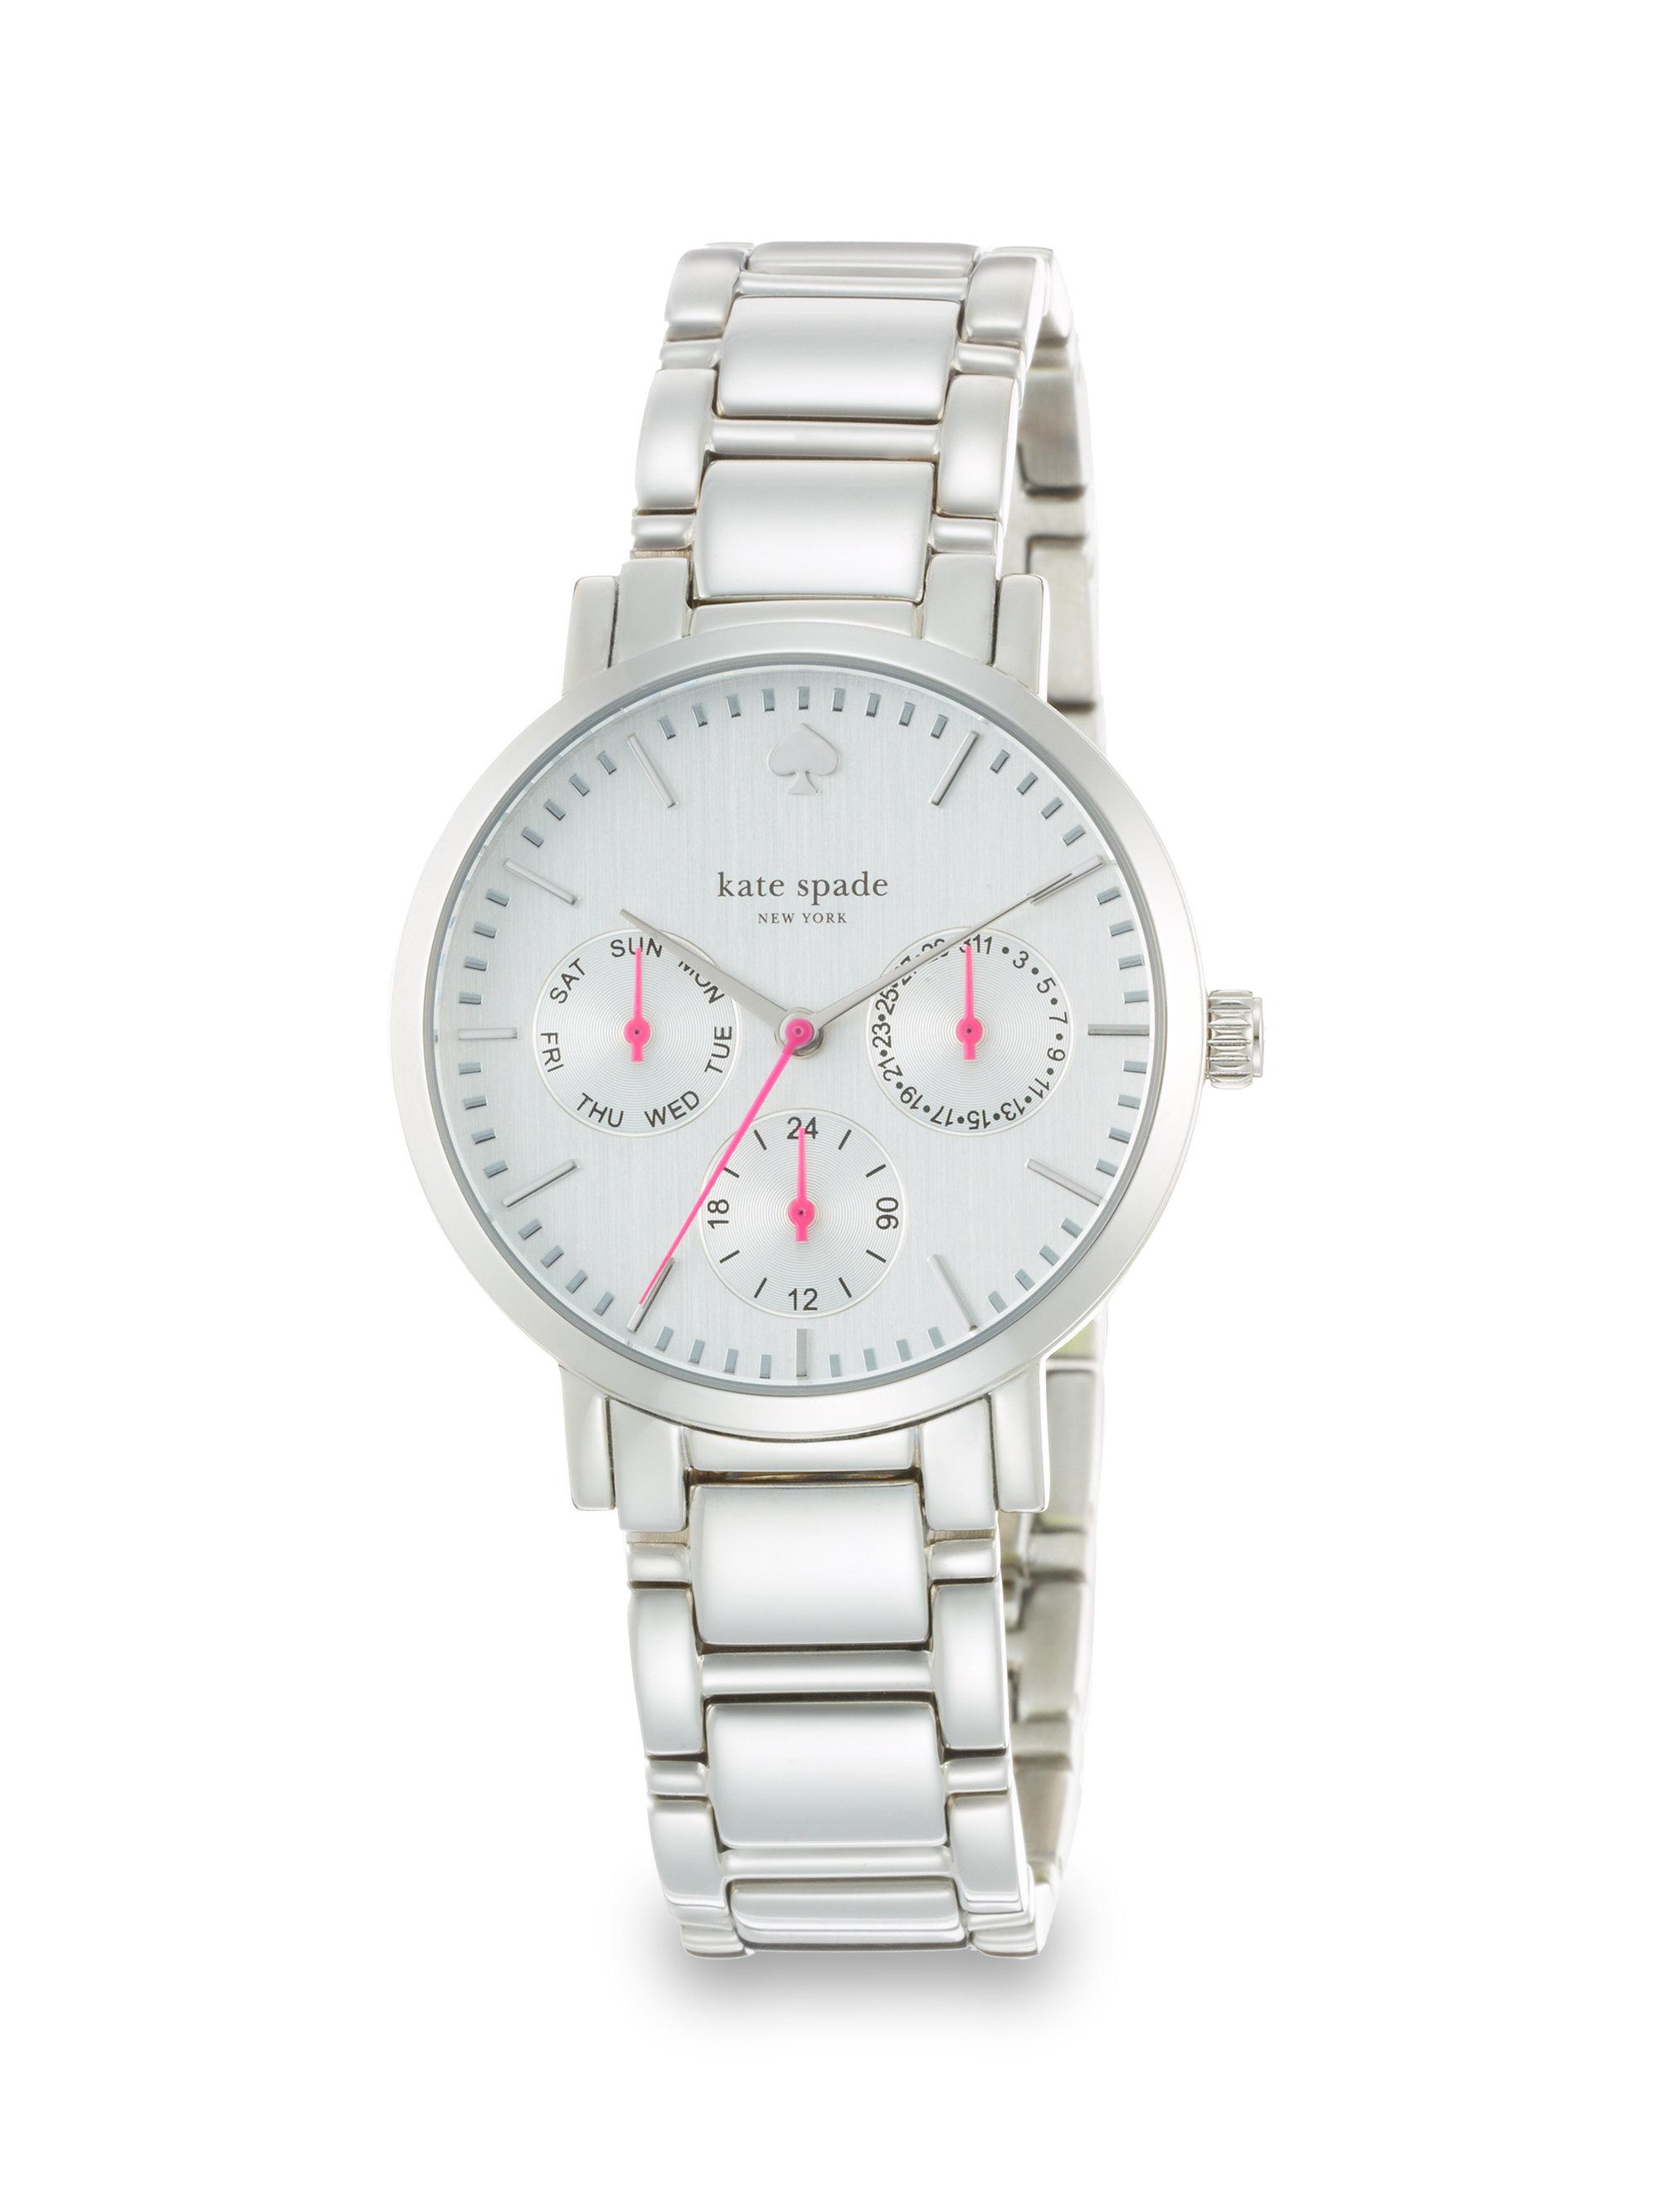 Gramercy Grand Stainless Steel Chronograph Bracelet Watch